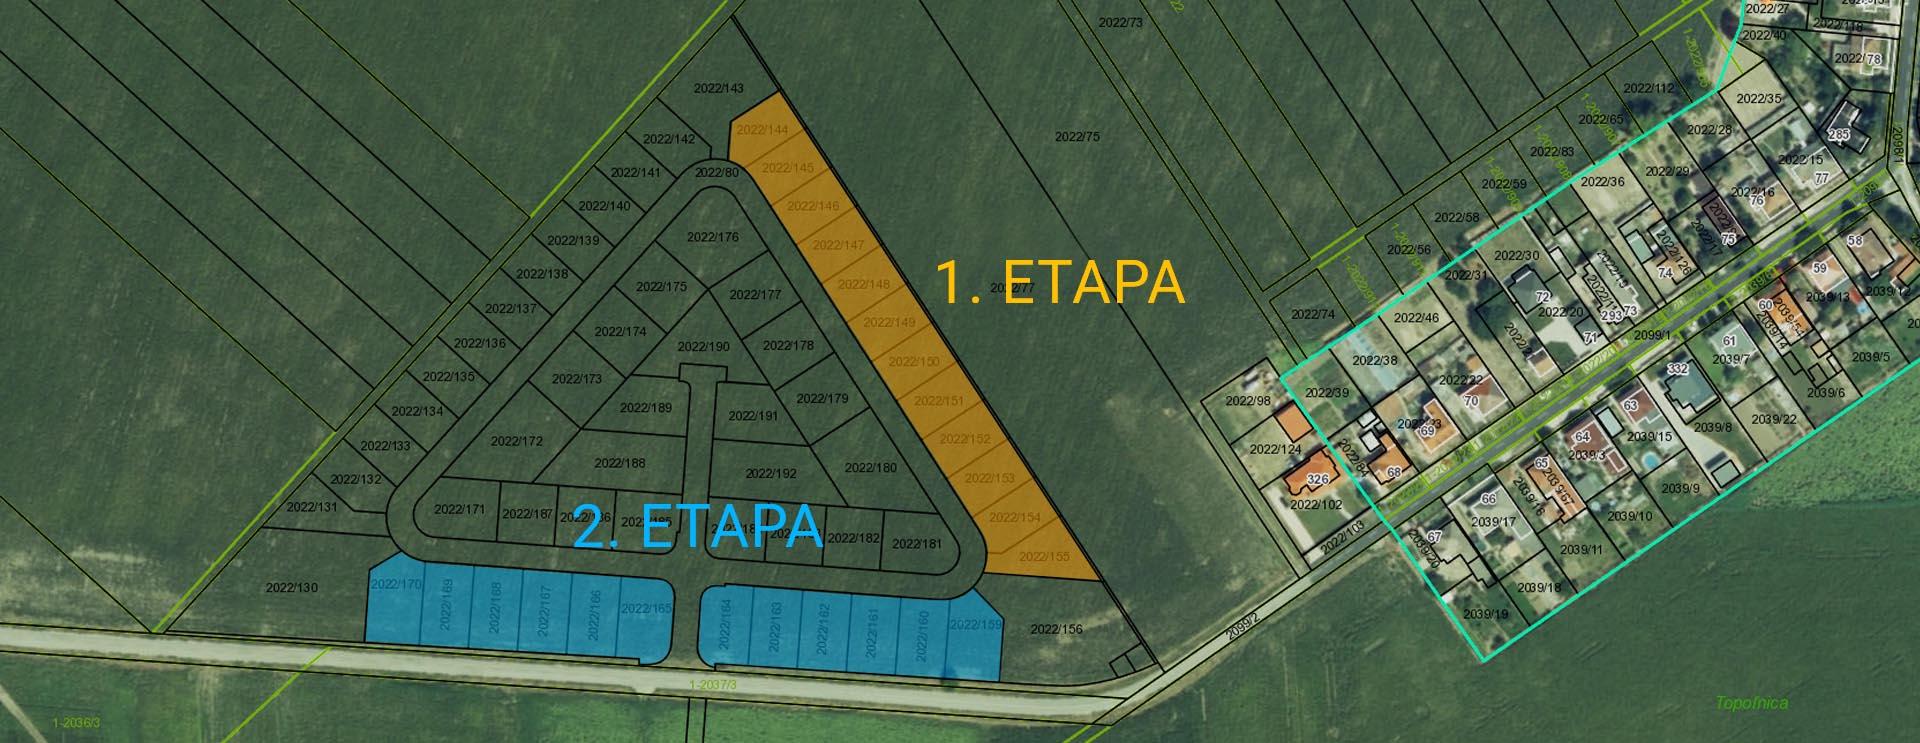 katastralna mapa ETAPY2